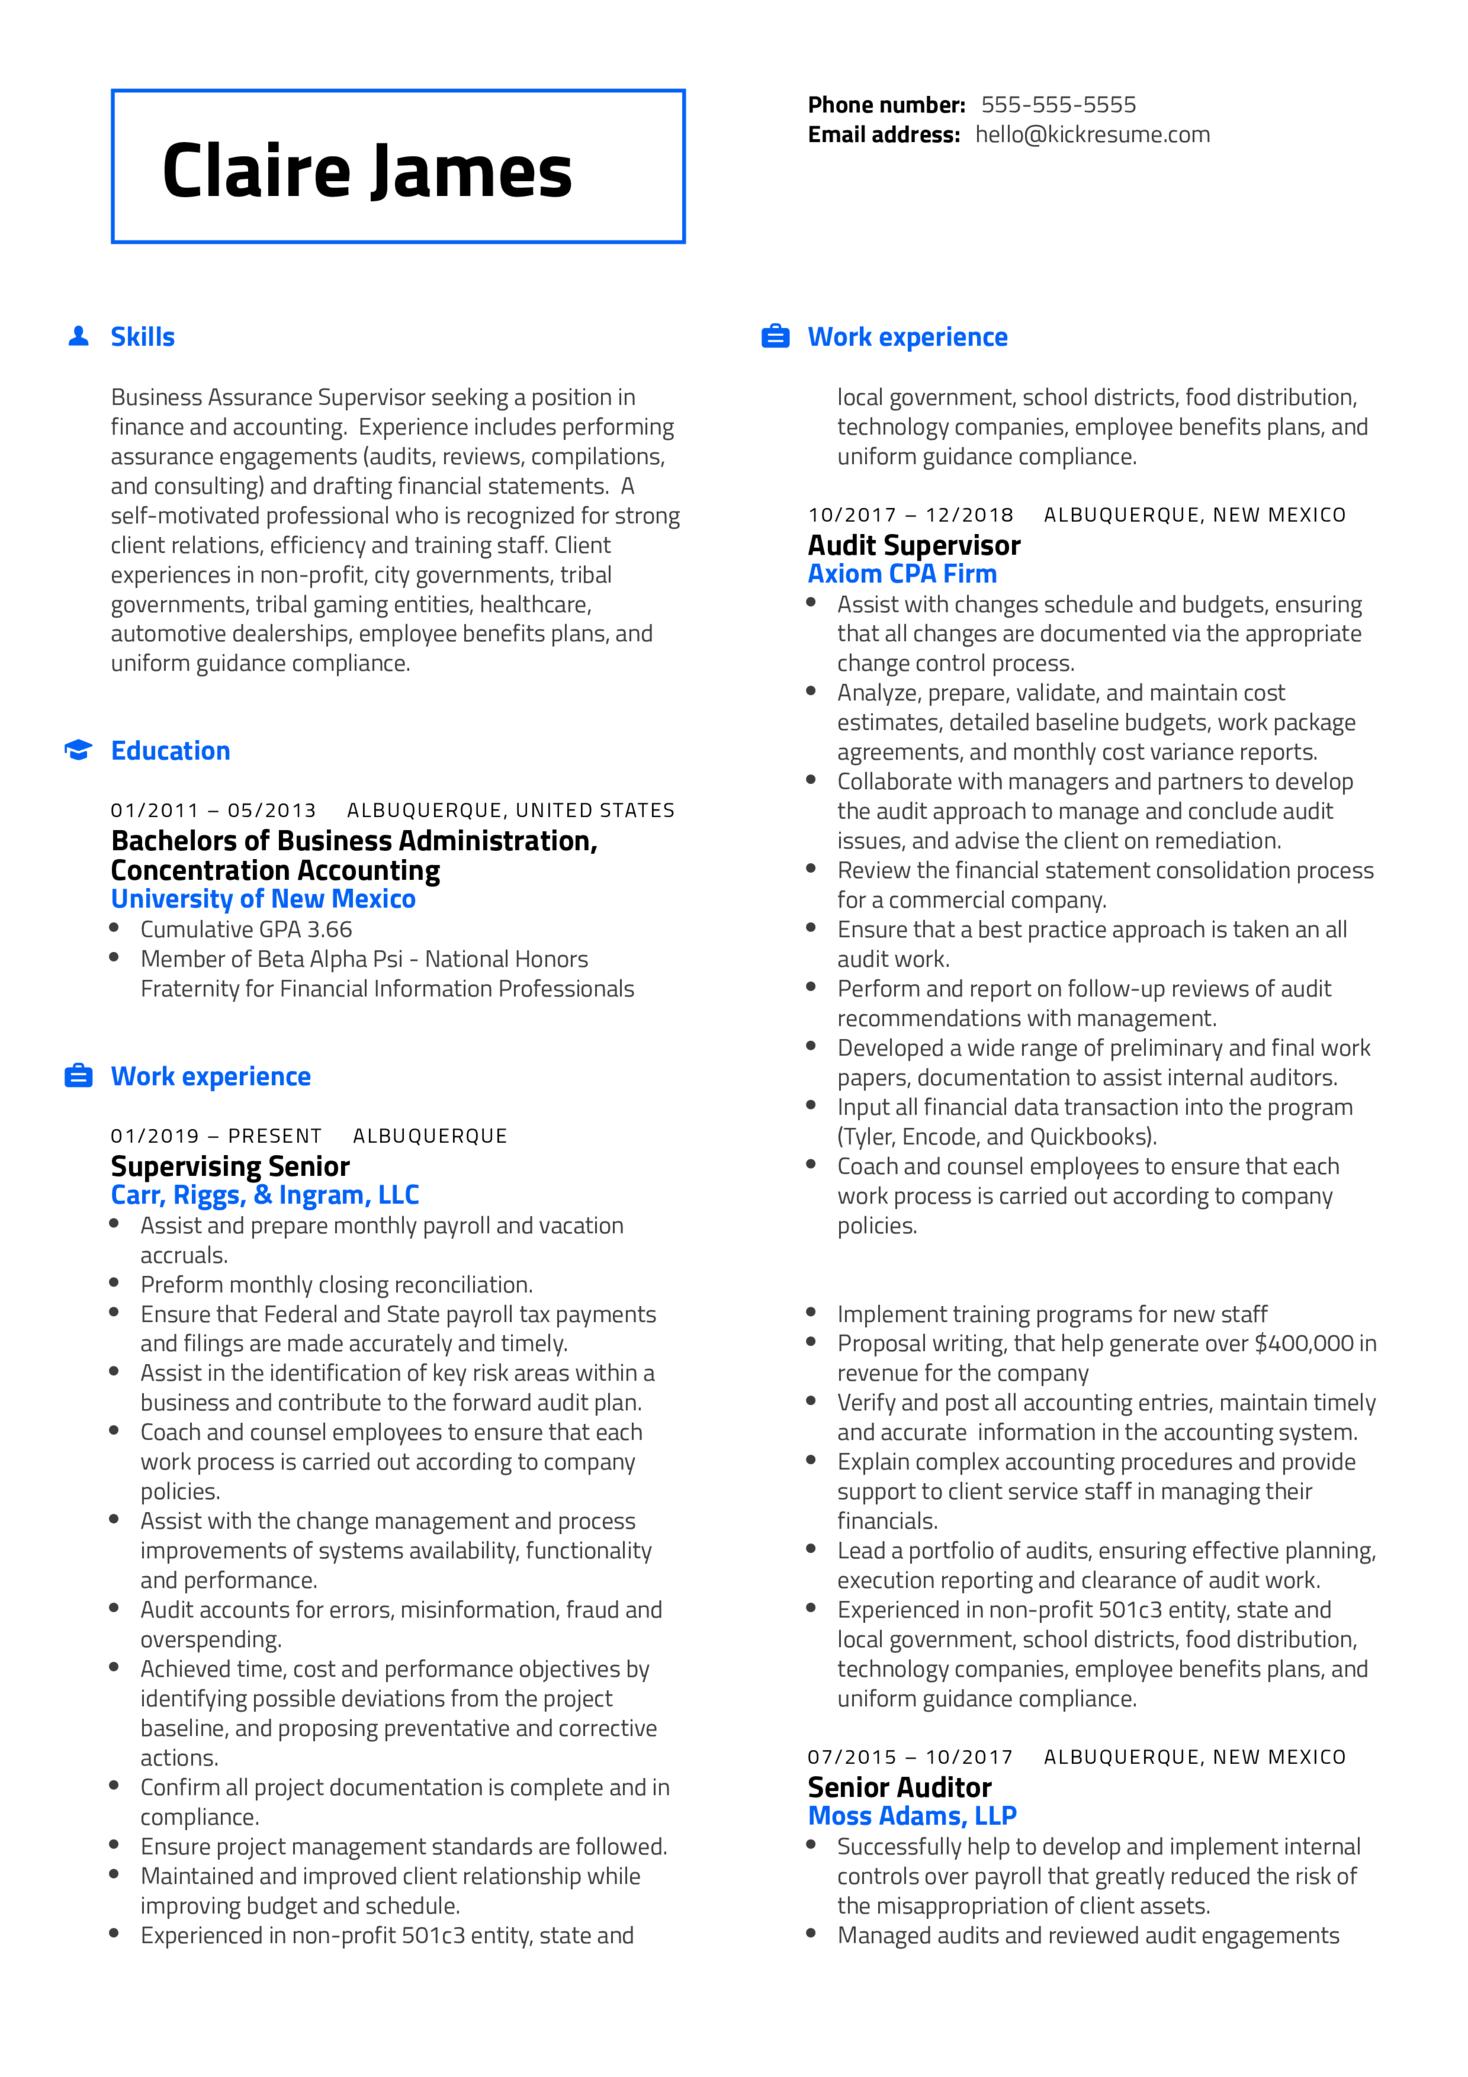 Controller at RiskSense Resume Sample (parte 1)